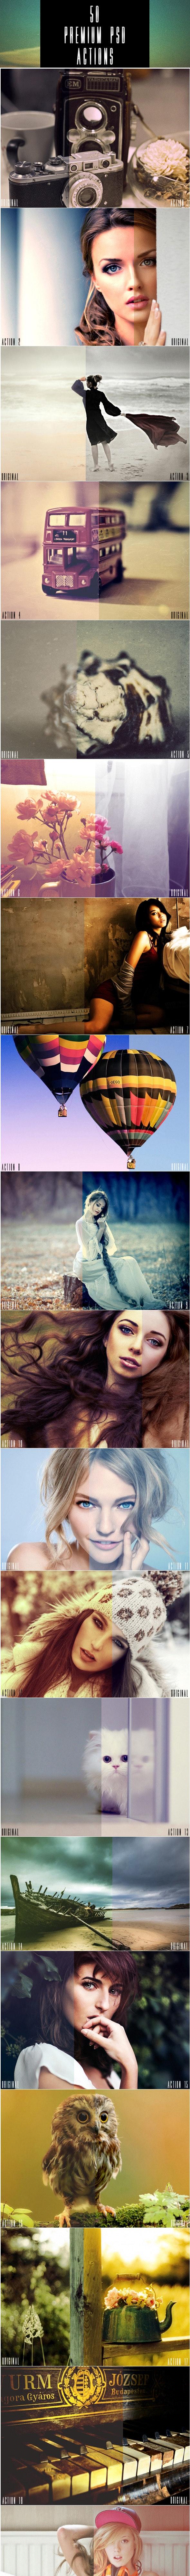 50 Premium Photoshop Actions - Photo Effects Actions